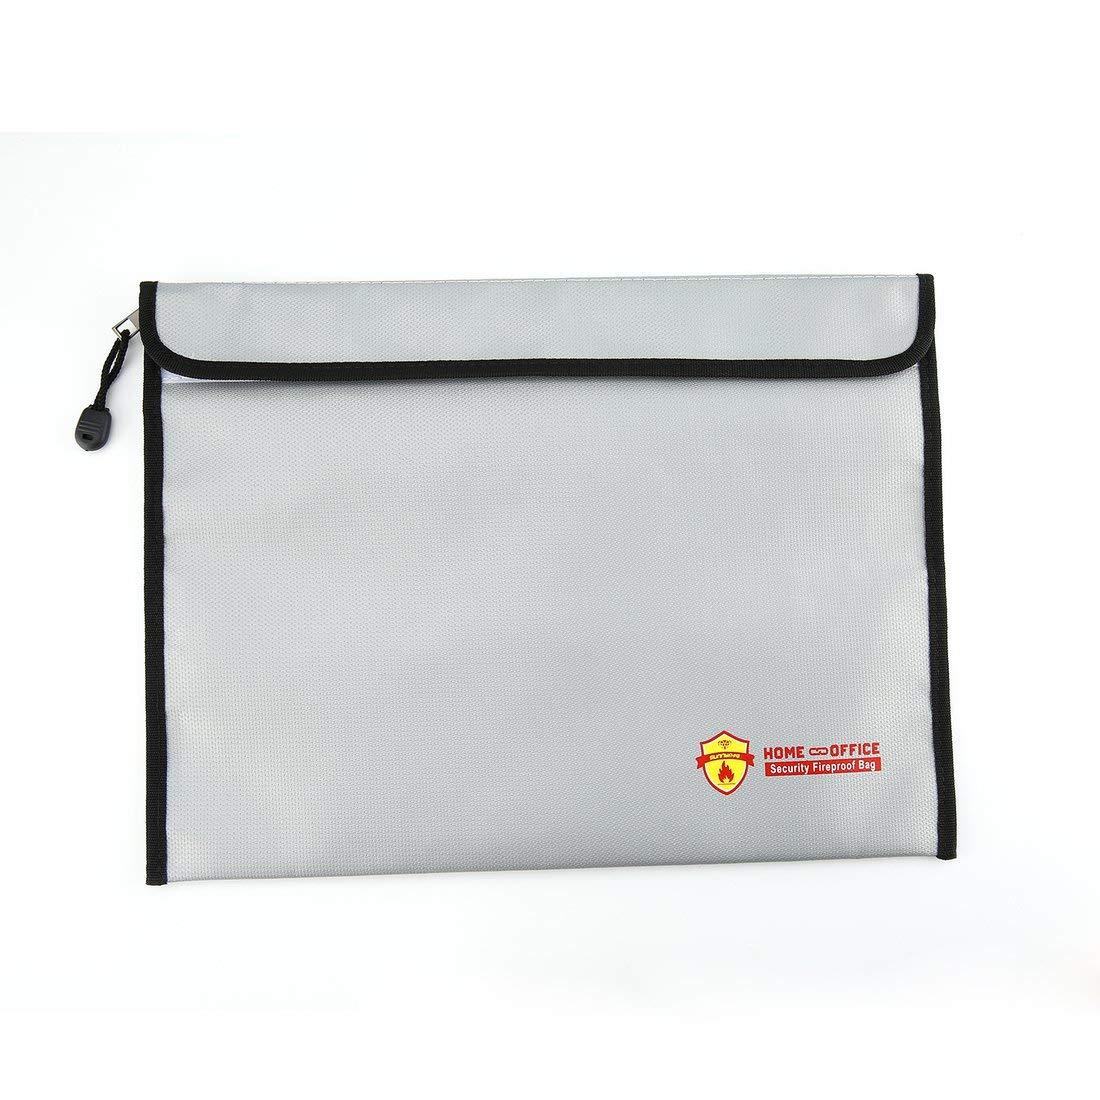 Sunnylife Battery Safe Bag Explosion-Proof Folder Security Fireproof Waterproof Bag Storage Home Office Document File Guard Formulaone